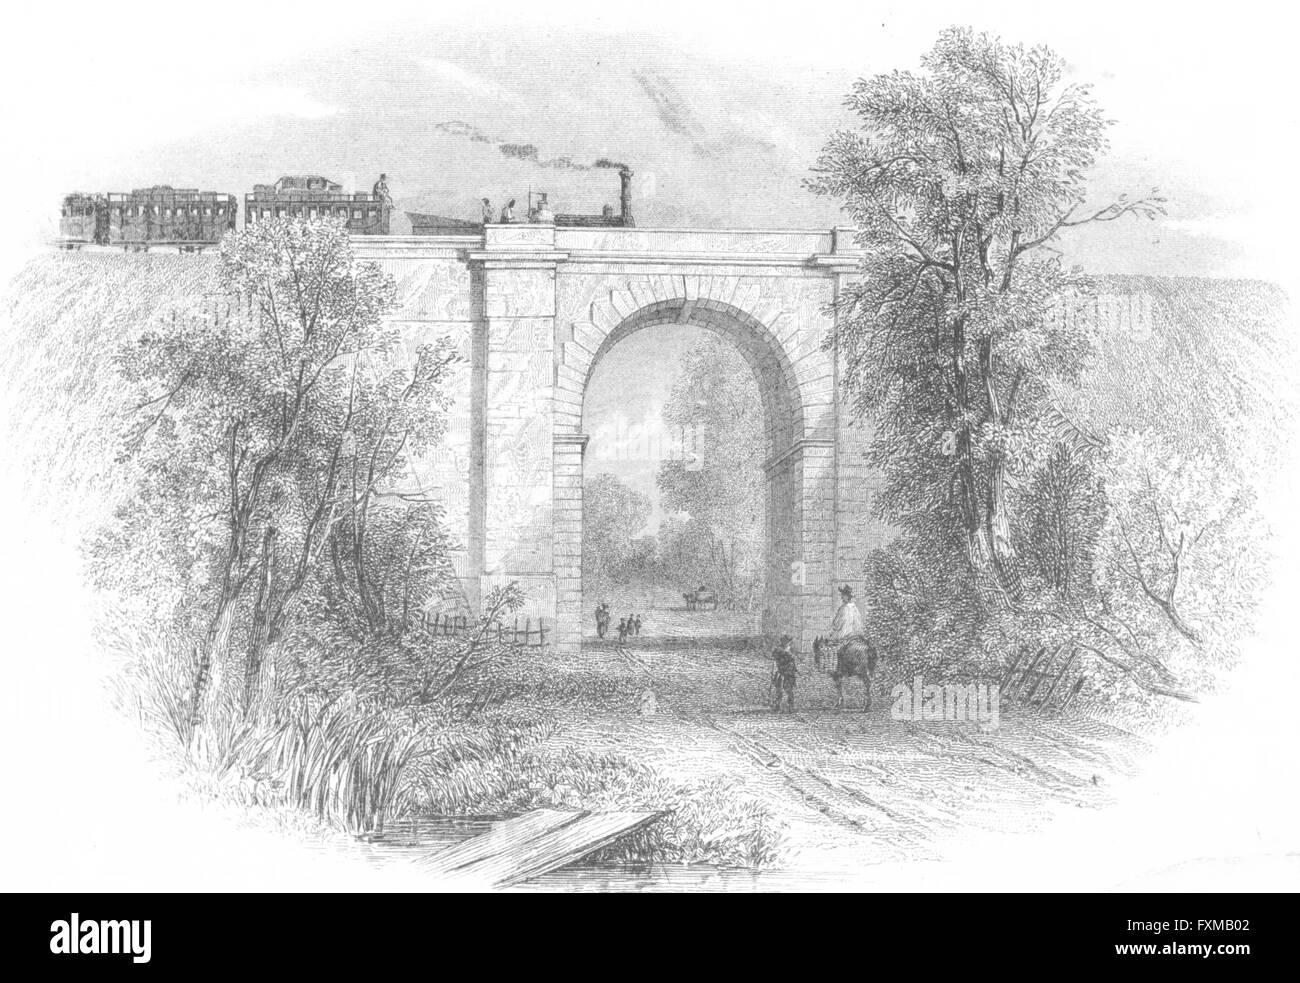 NORTHANTS: Blisworth viaduct trains, antique print 1860 - Stock Image